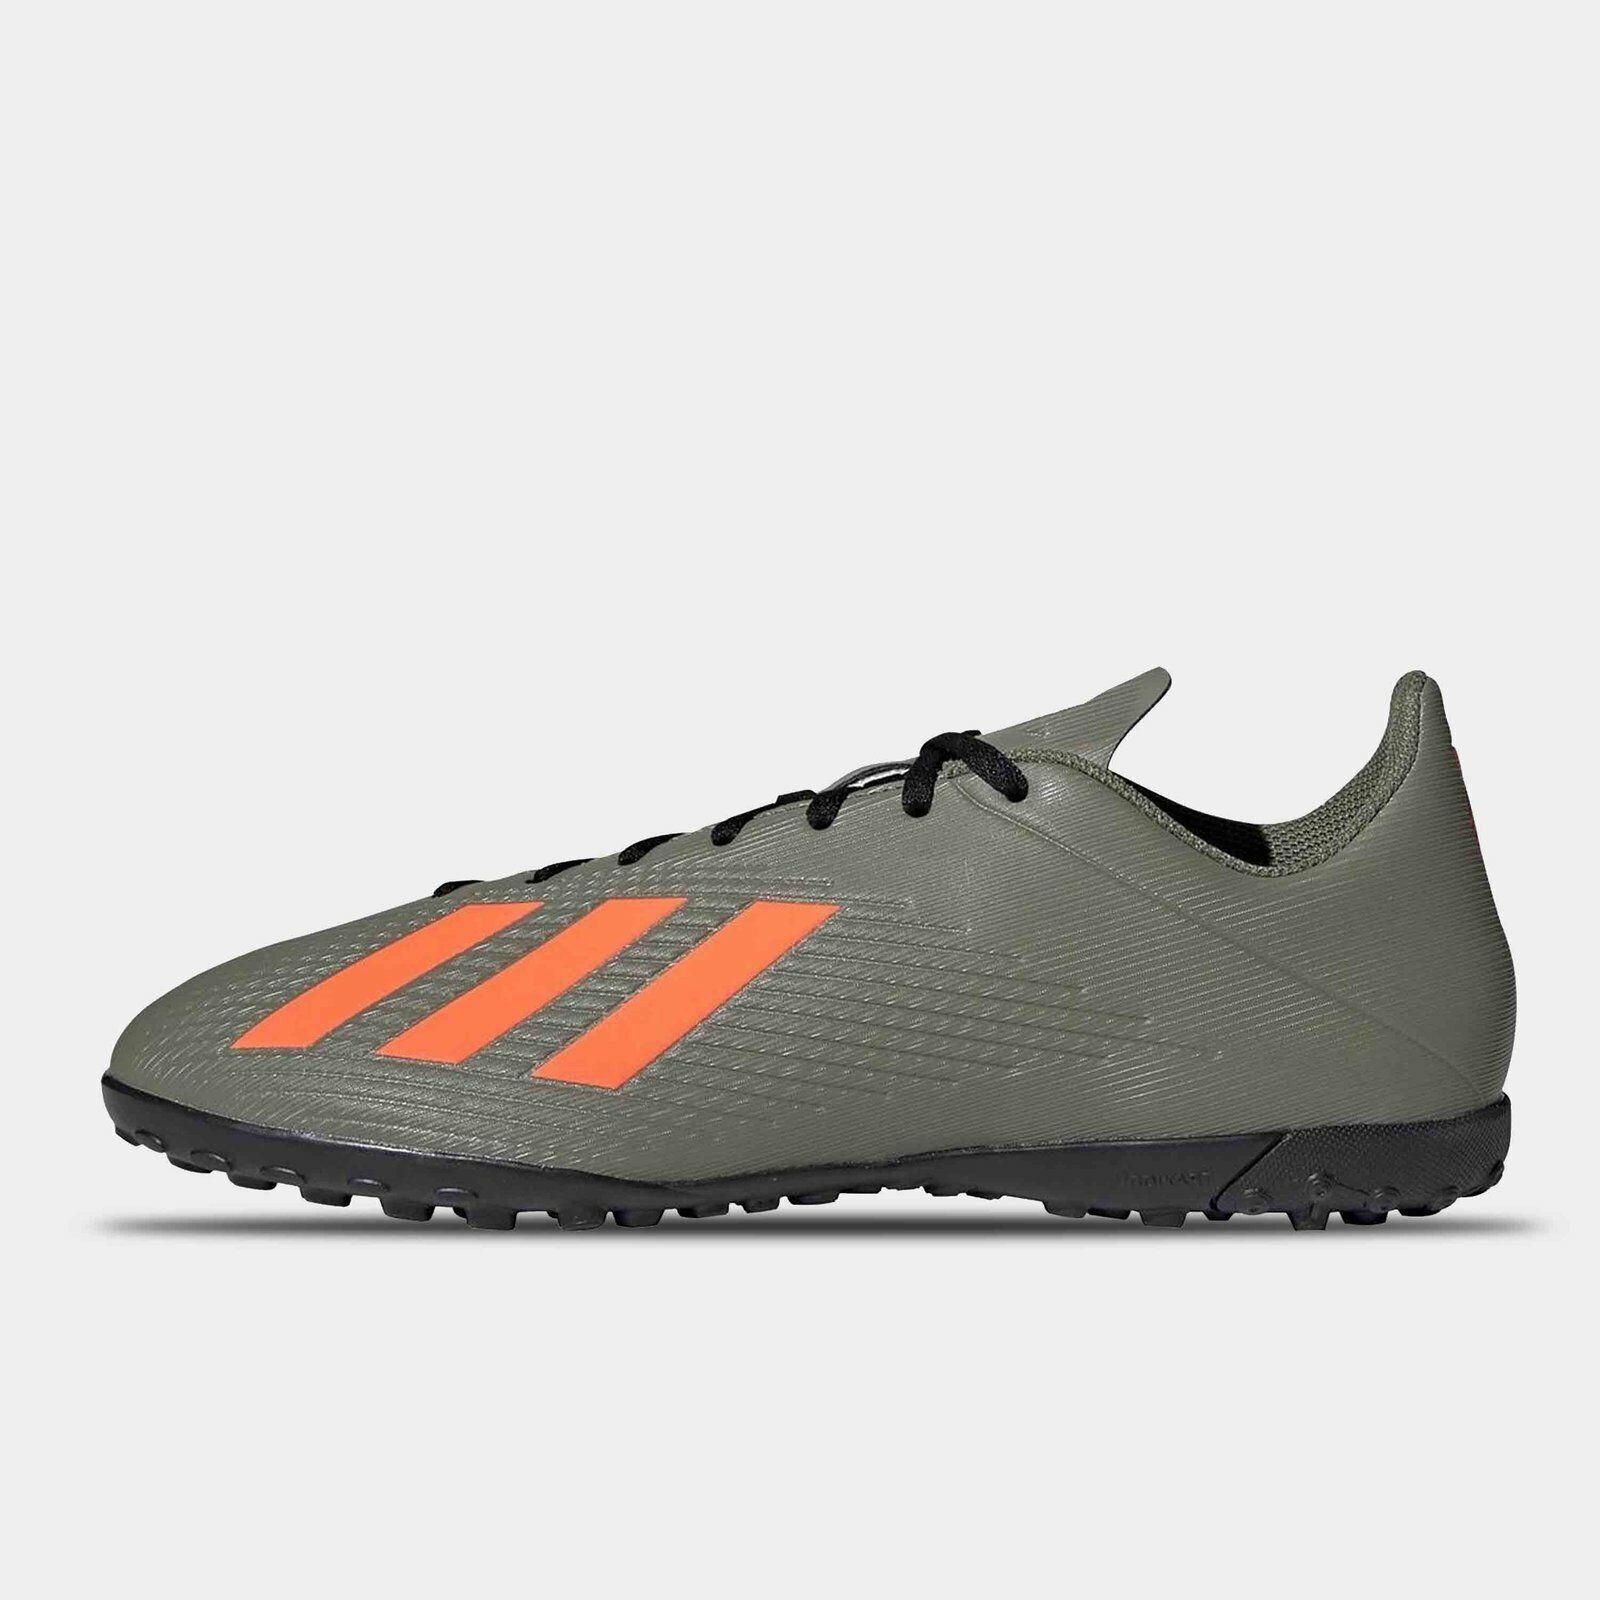 adidas Mens X 19.4 Astro Turf Trainers Legend Green Orange Sports Shoes